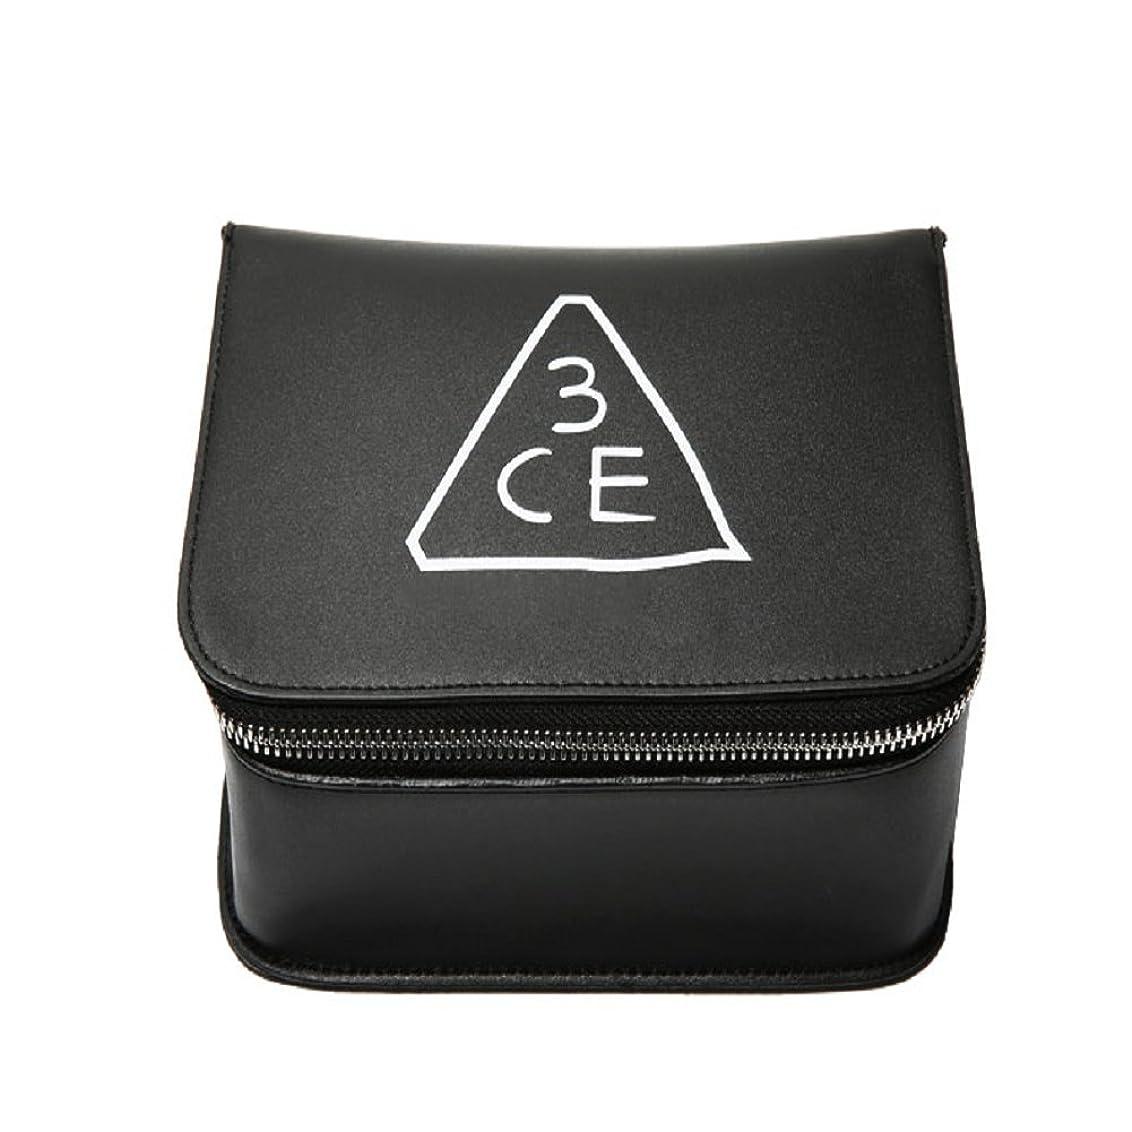 3CE(3 CONCEPT EYES) COSMETIC BOX POUCH 化粧品 BOXポーチ stylenanda 婦人向け 旅行 ビッグサイズ[韓国並行輸入品]